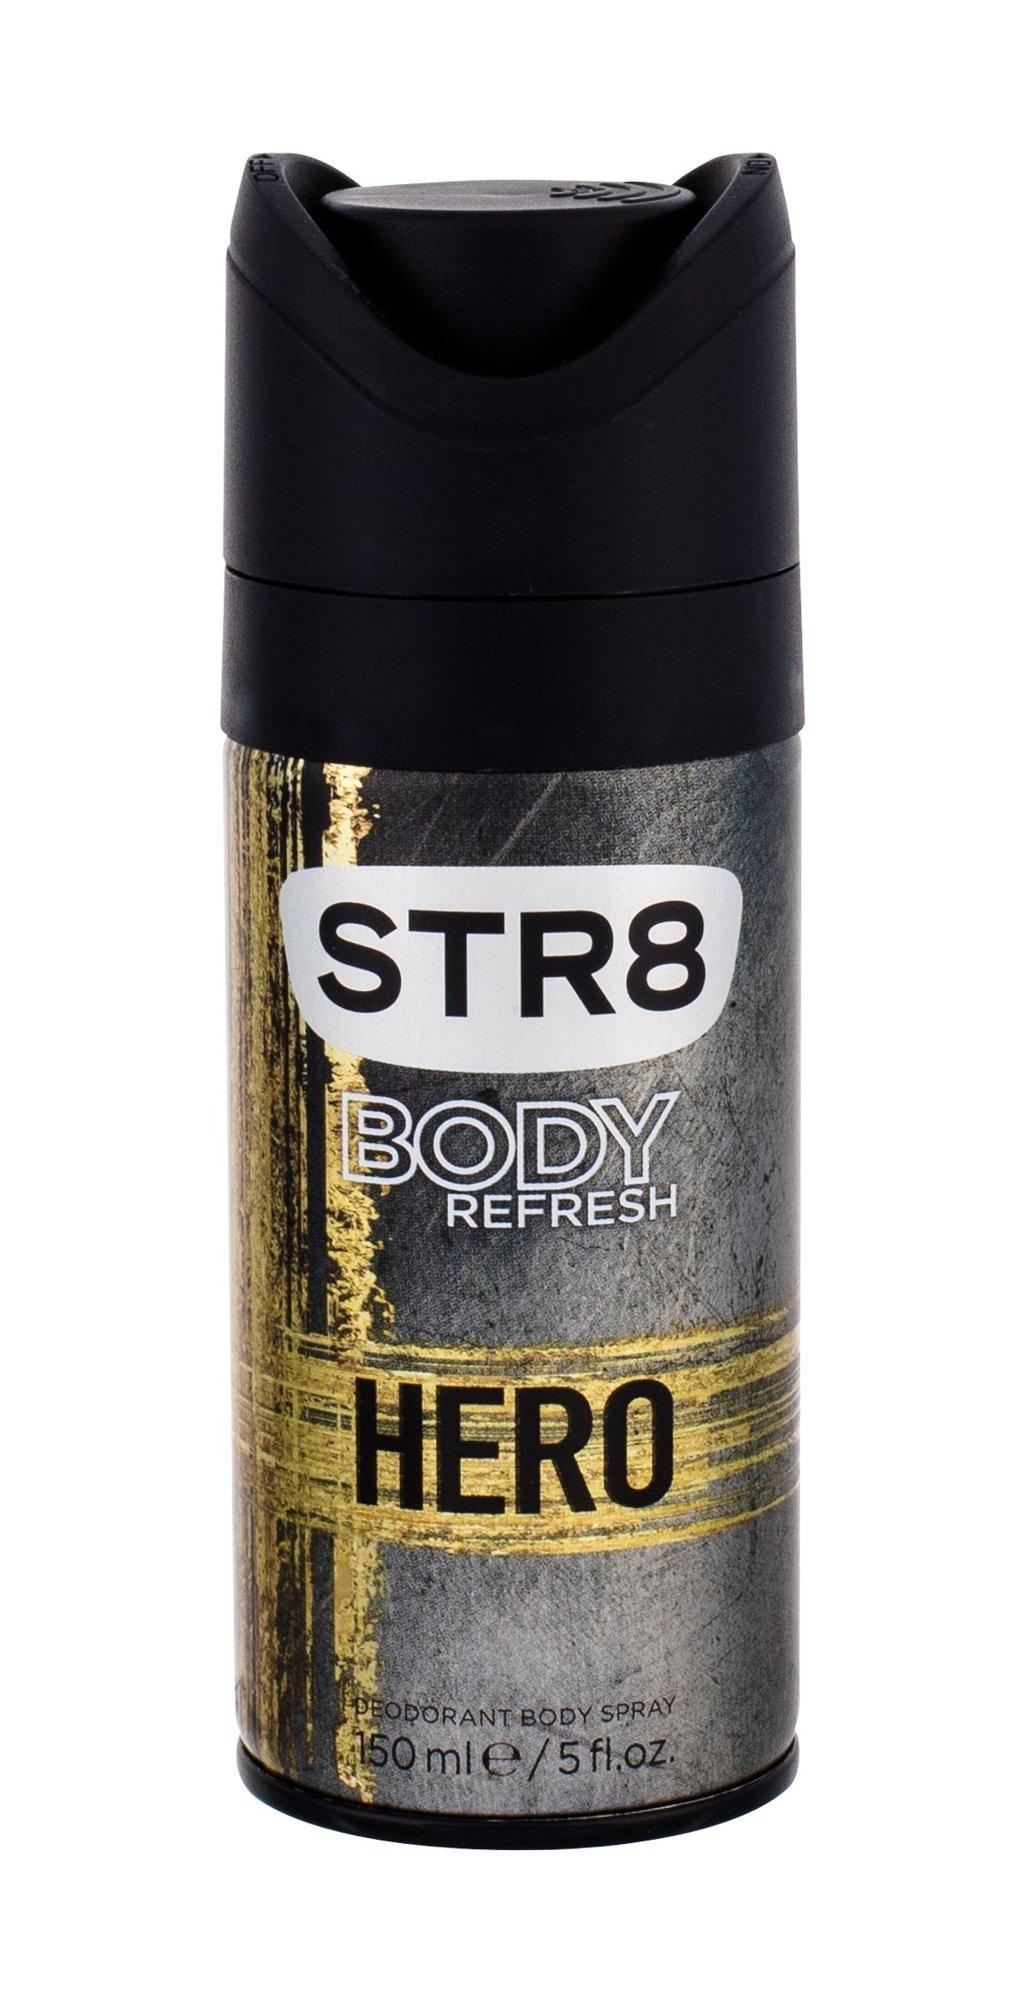 STR8 Hero Deodorant 150ml